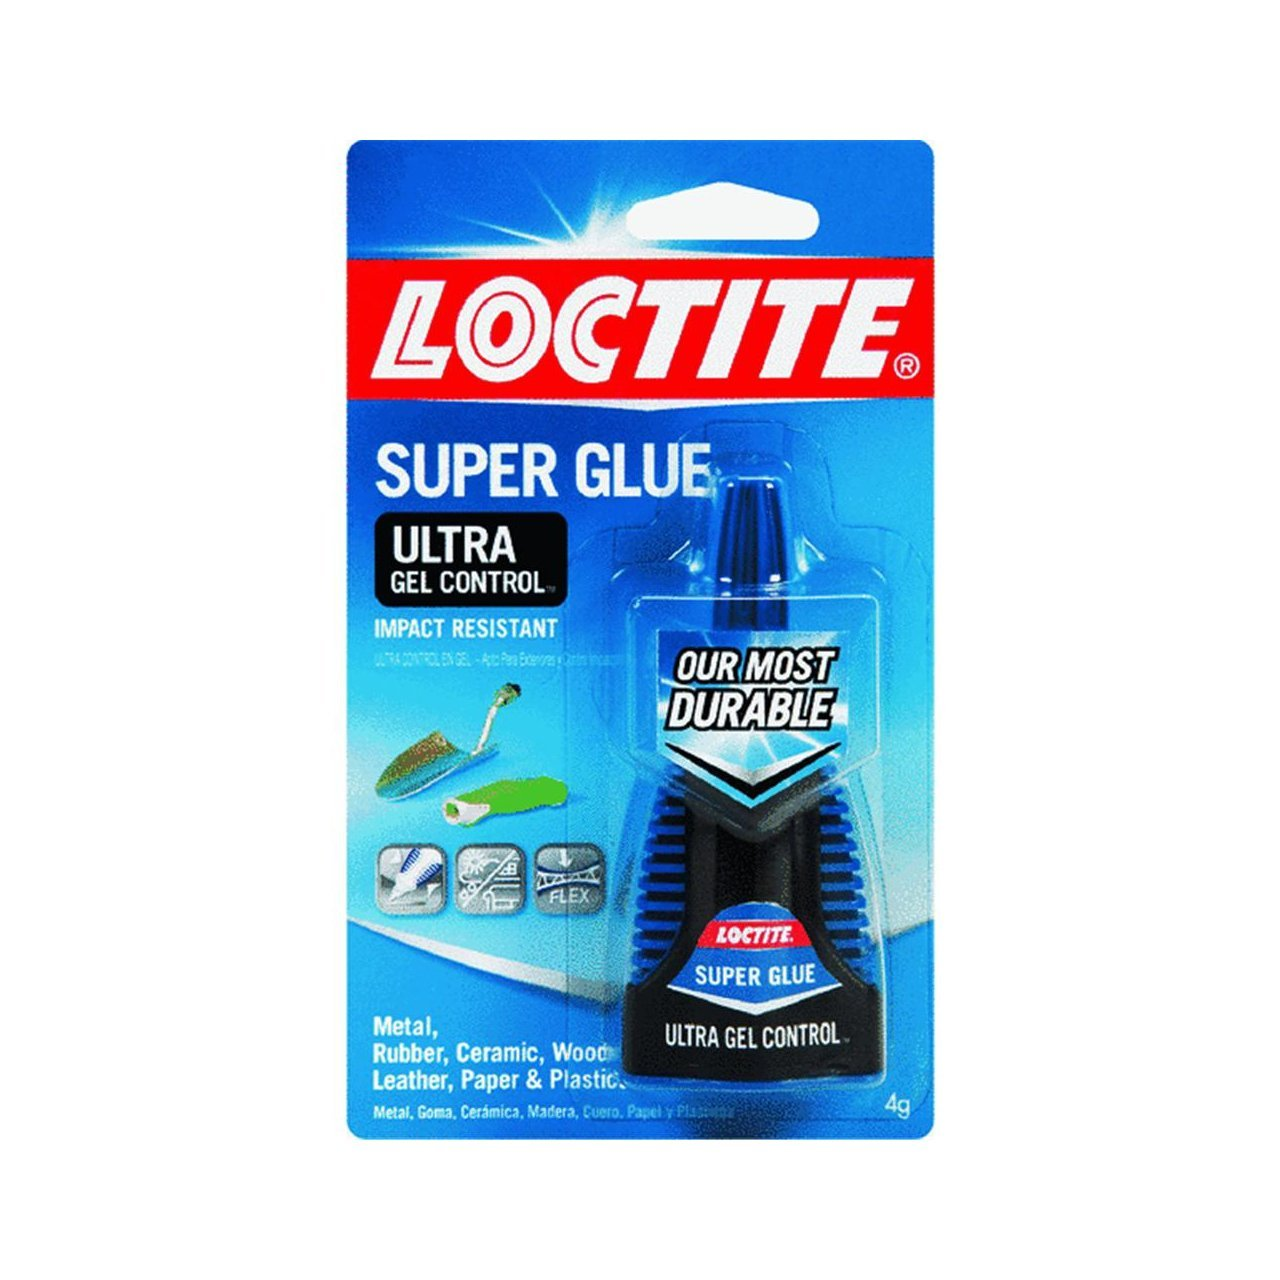 Loctite 1363589 4-Gram Bottle Super Glue Ultra Gel Control Adhesive, 3-Pack